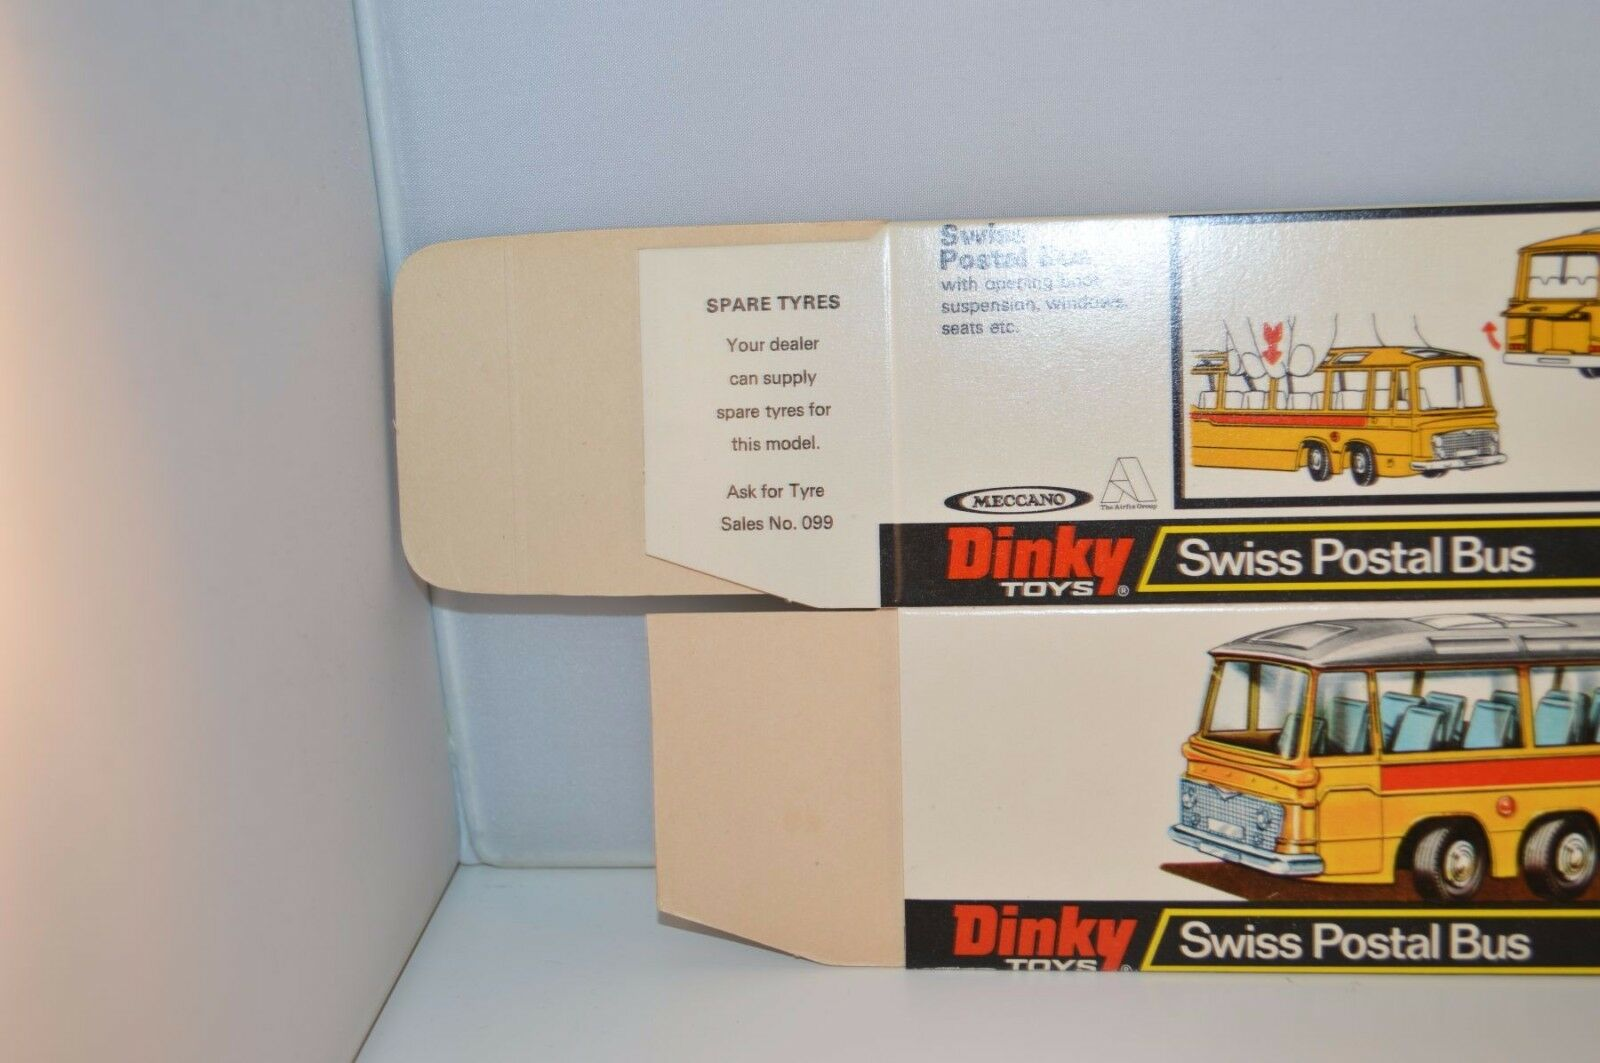 Dinky Toys 961 961 961 Swiss Postal Bus empty perfect mint original complete box SUPERB c8c4eb